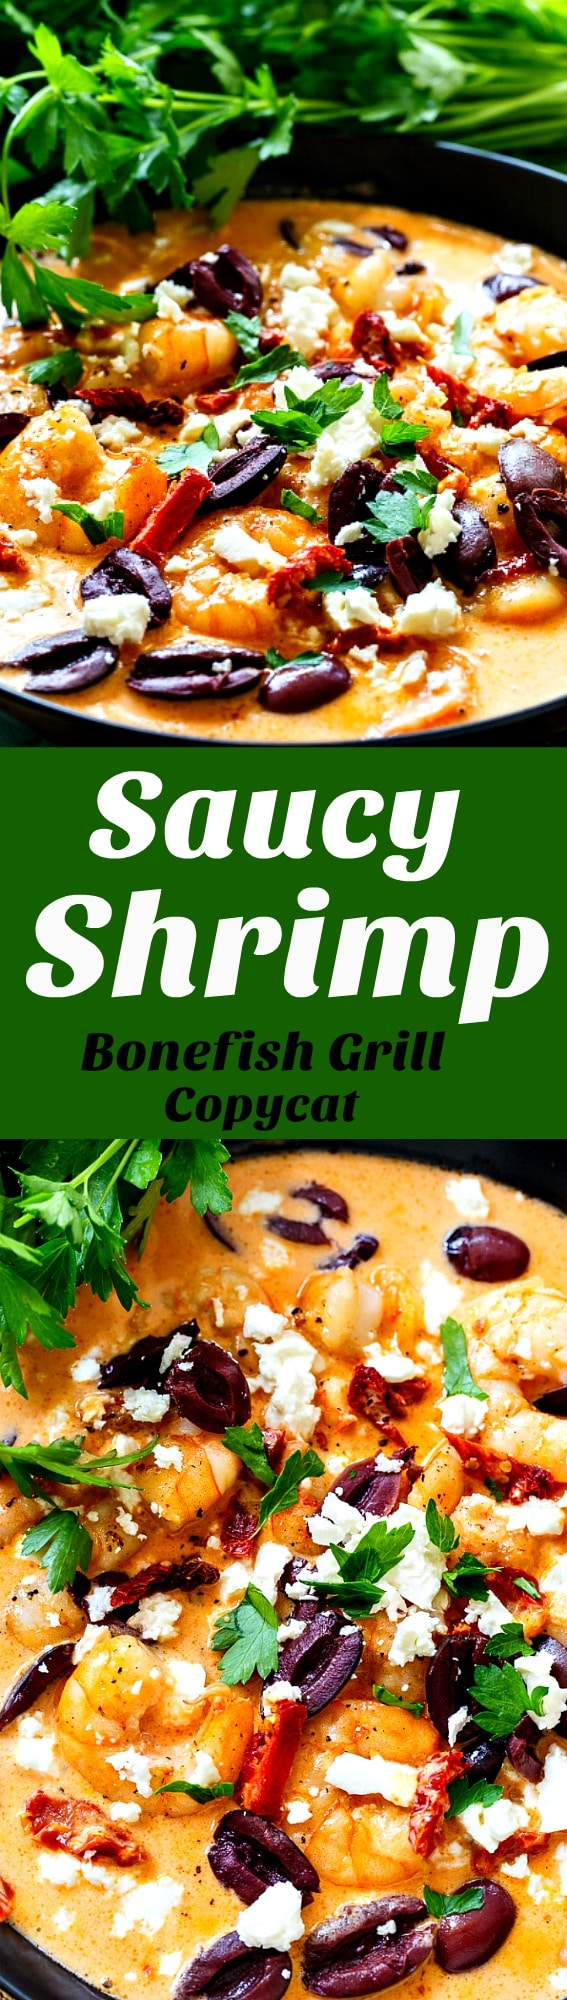 Saucy Shrimp- Bonefish Grill copycat. One of my favorite appetizers!